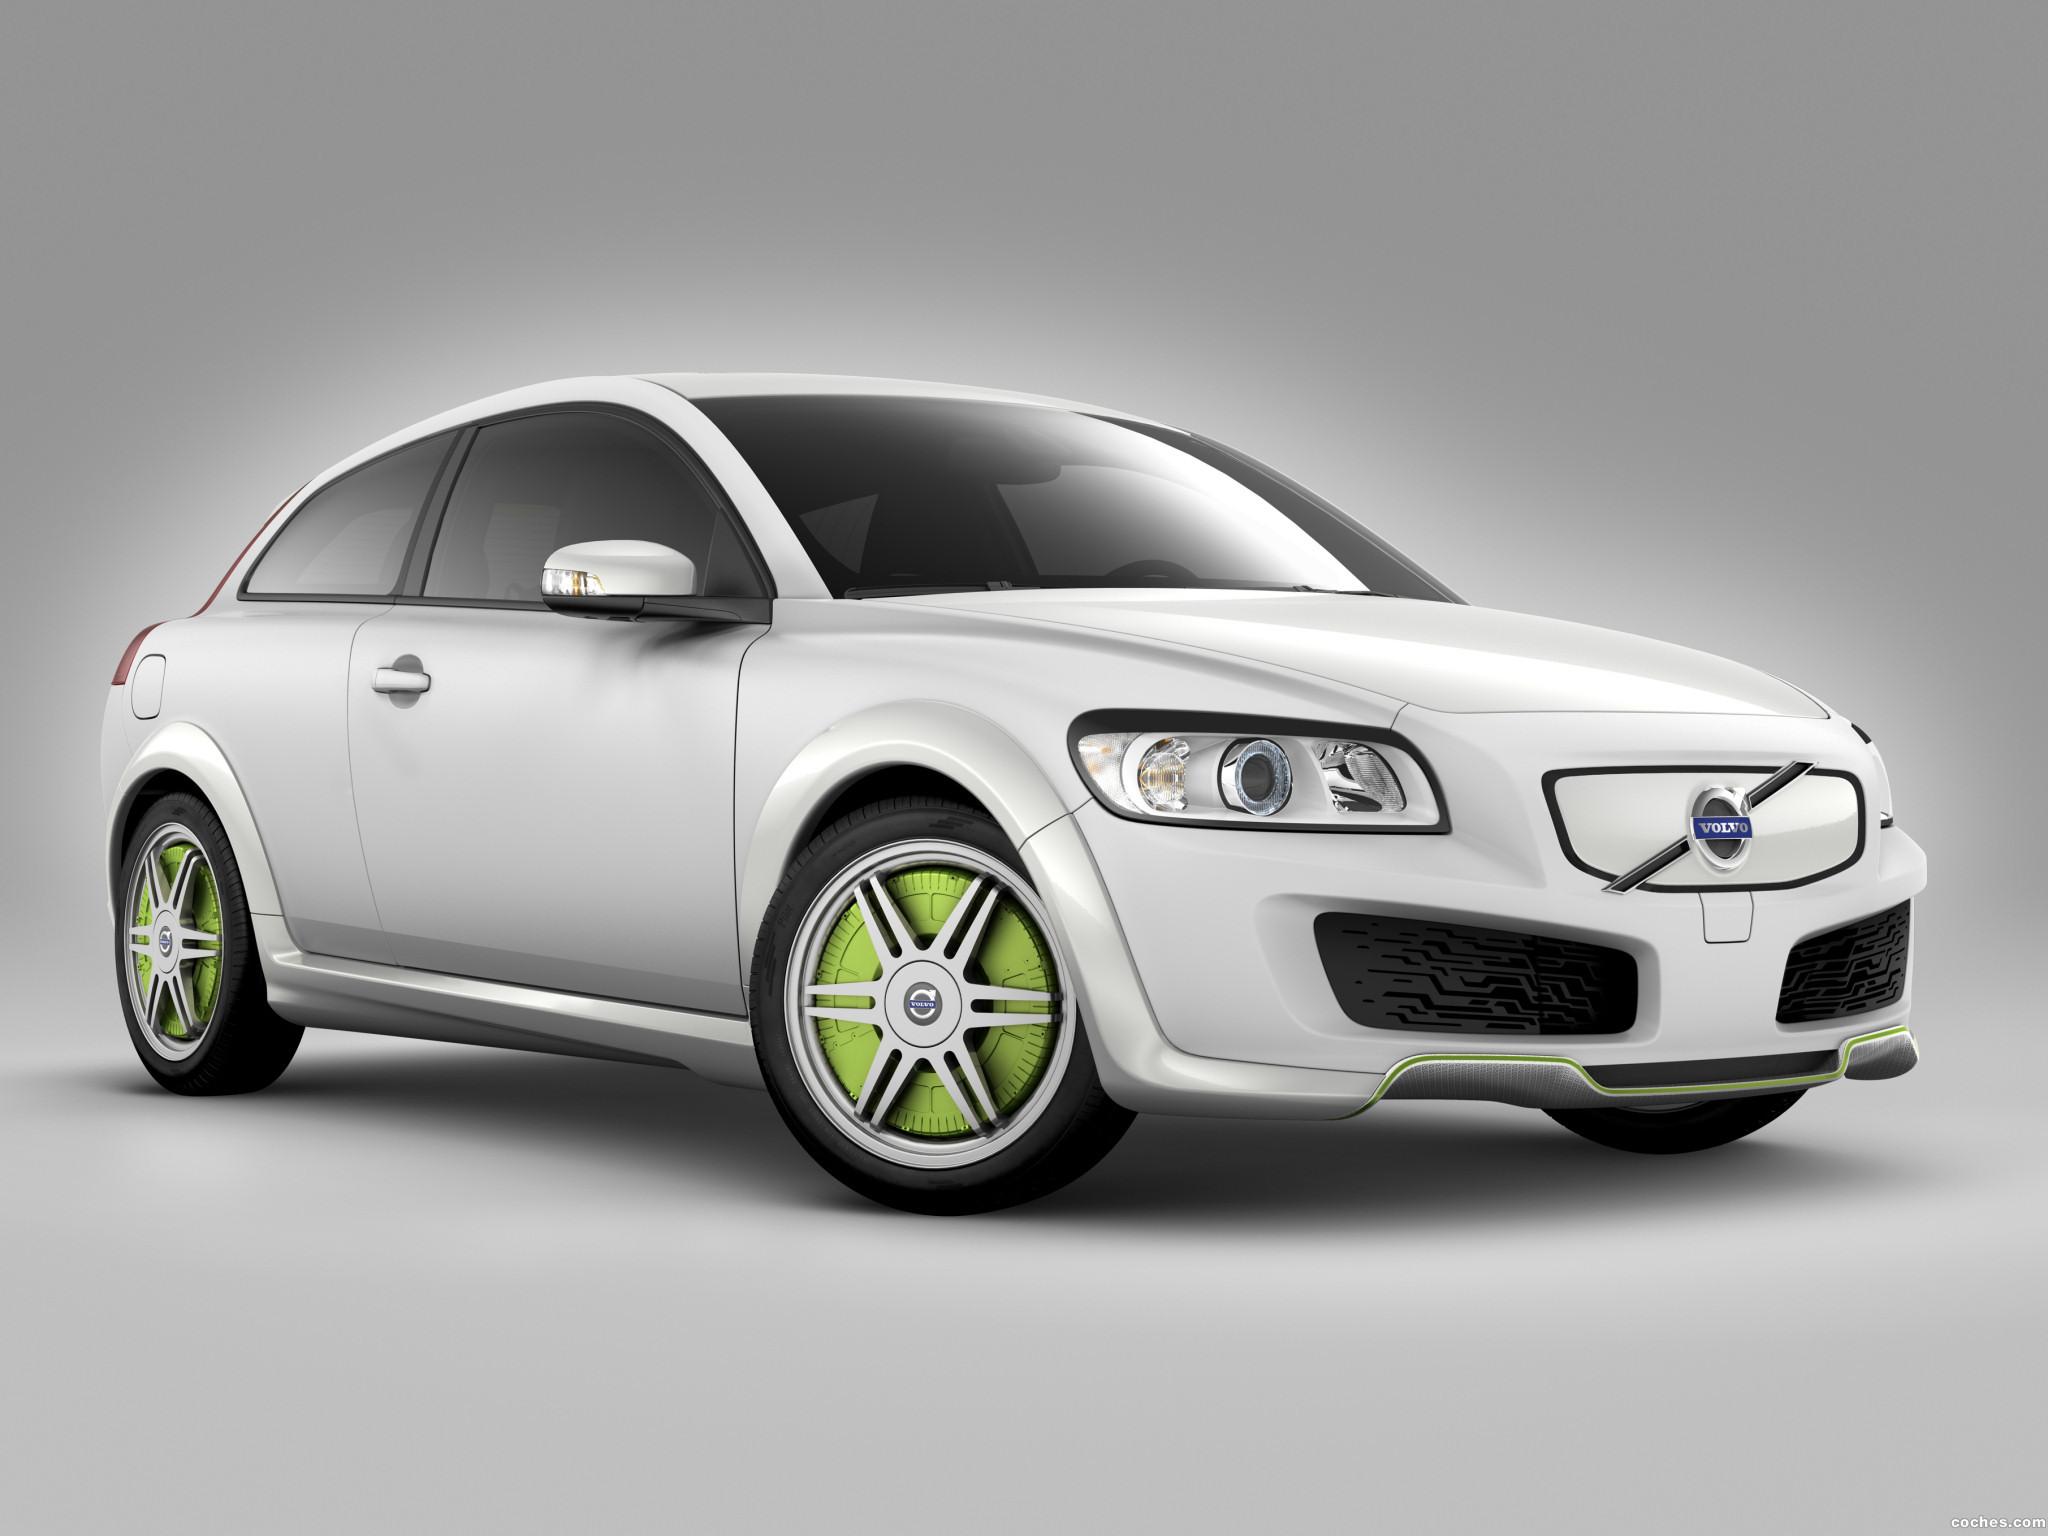 Foto 0 de Volvo ReCharge Concept 2007